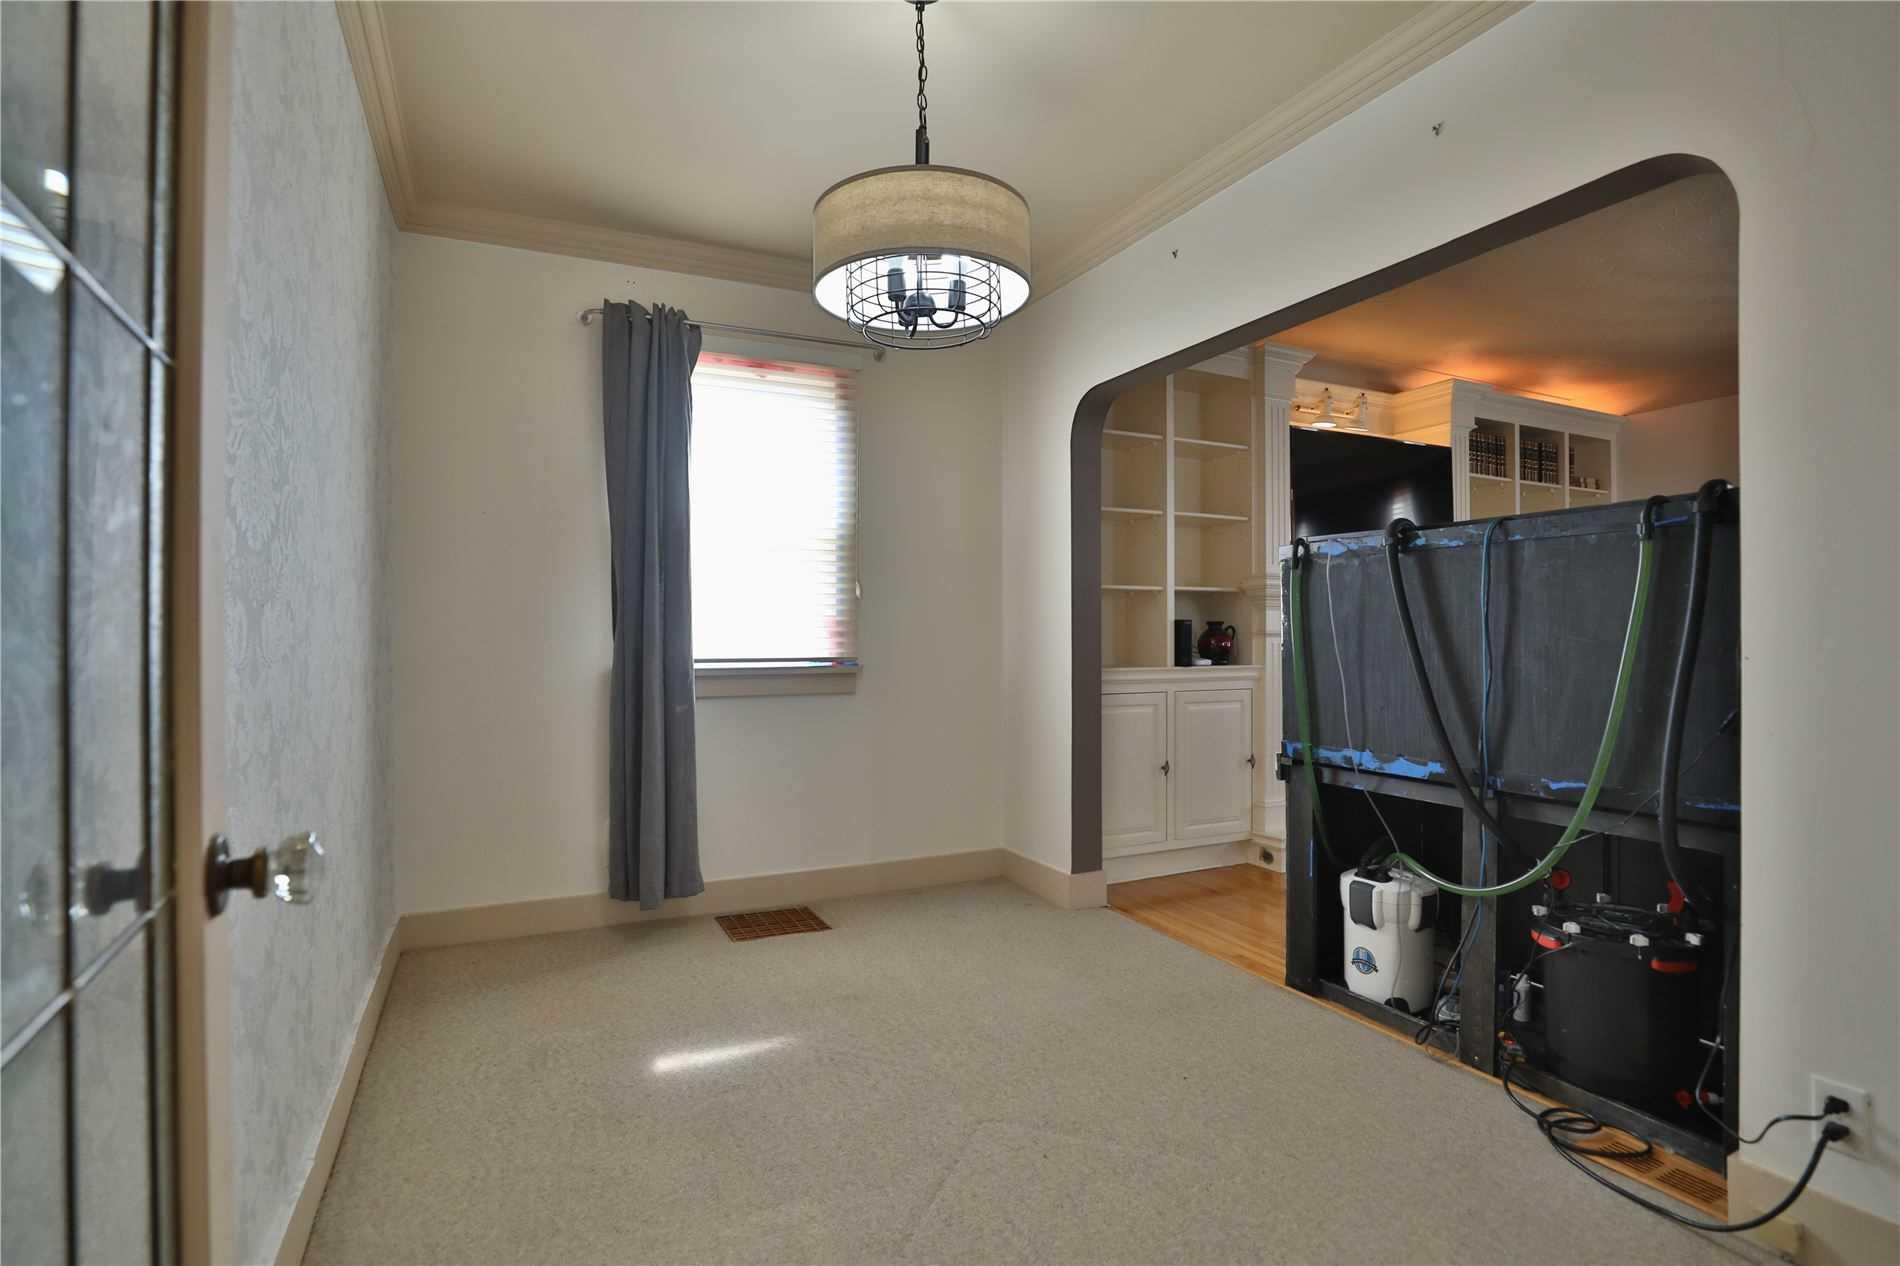 Detached house For Sale In Brantford - 113 Morton Ave, Brantford, Ontario, Canada N3R2N9 , 2 Bedrooms Bedrooms, ,2 BathroomsBathrooms,Detached,For Sale,Morton